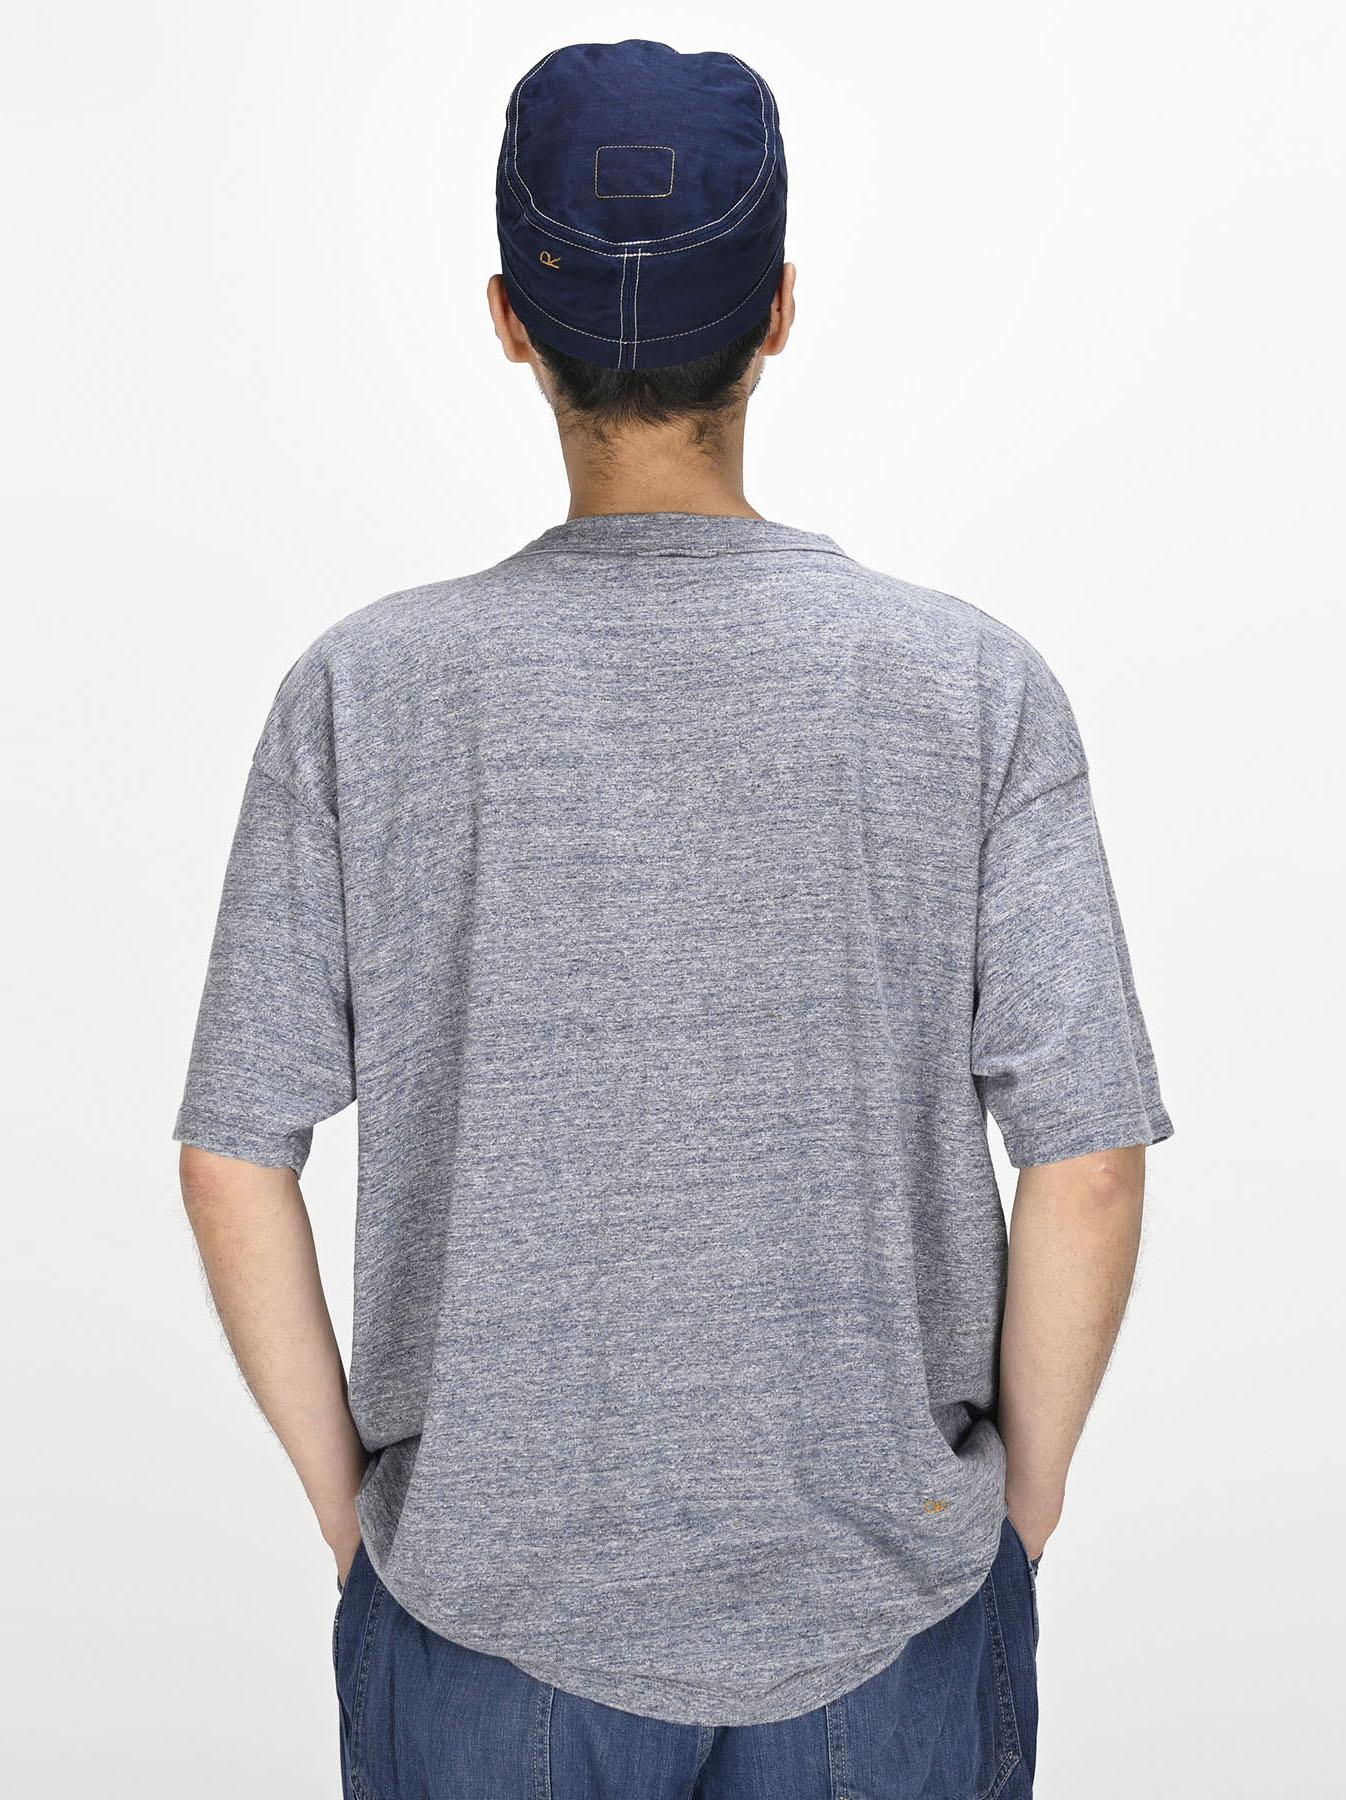 Top Sumite de Owl T-shirt-4